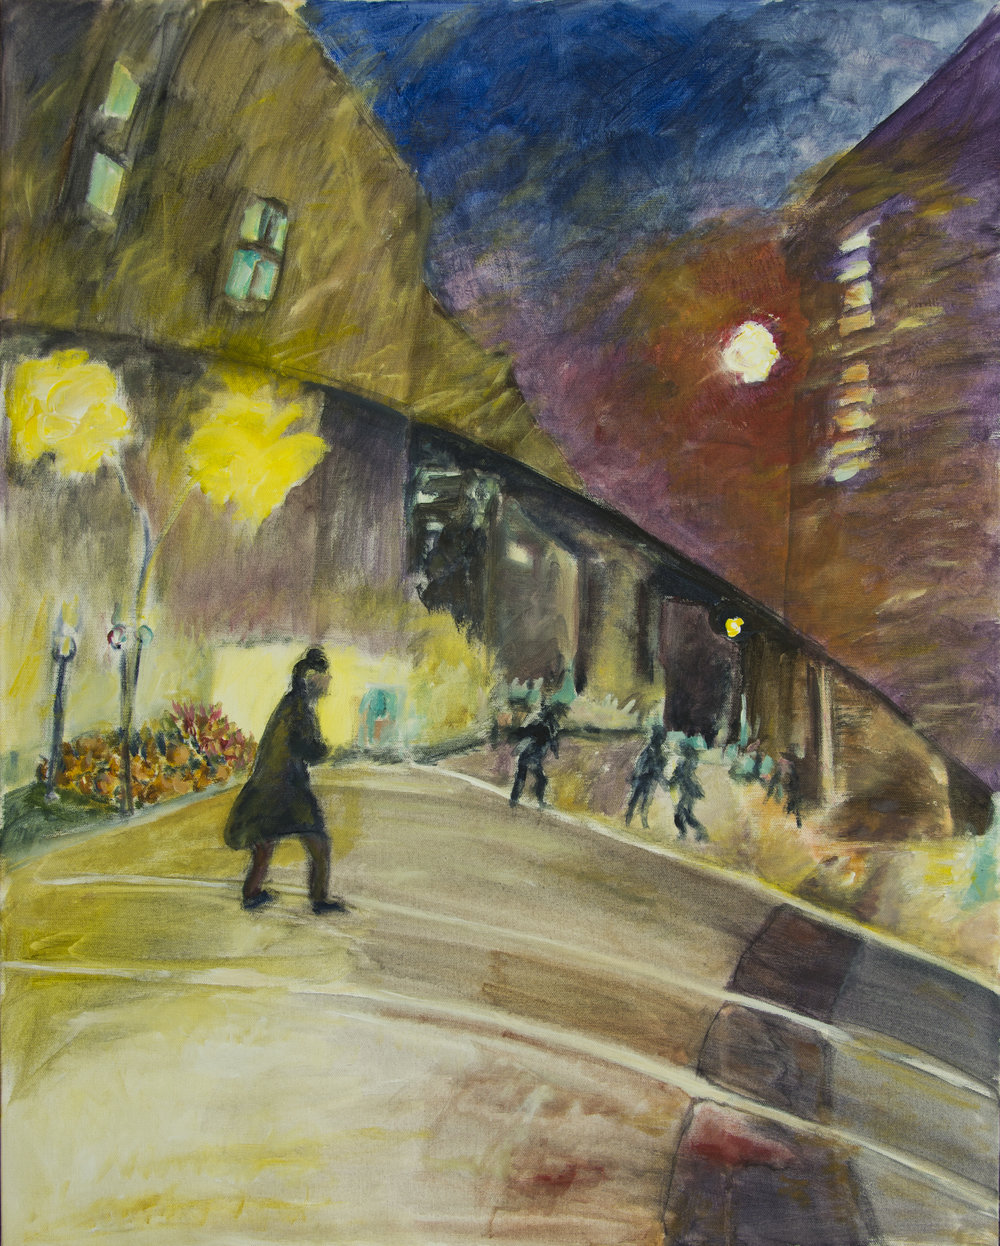 "City at Night acrylic on canvas 24"" x 30"" Rachel Lulov Segall"